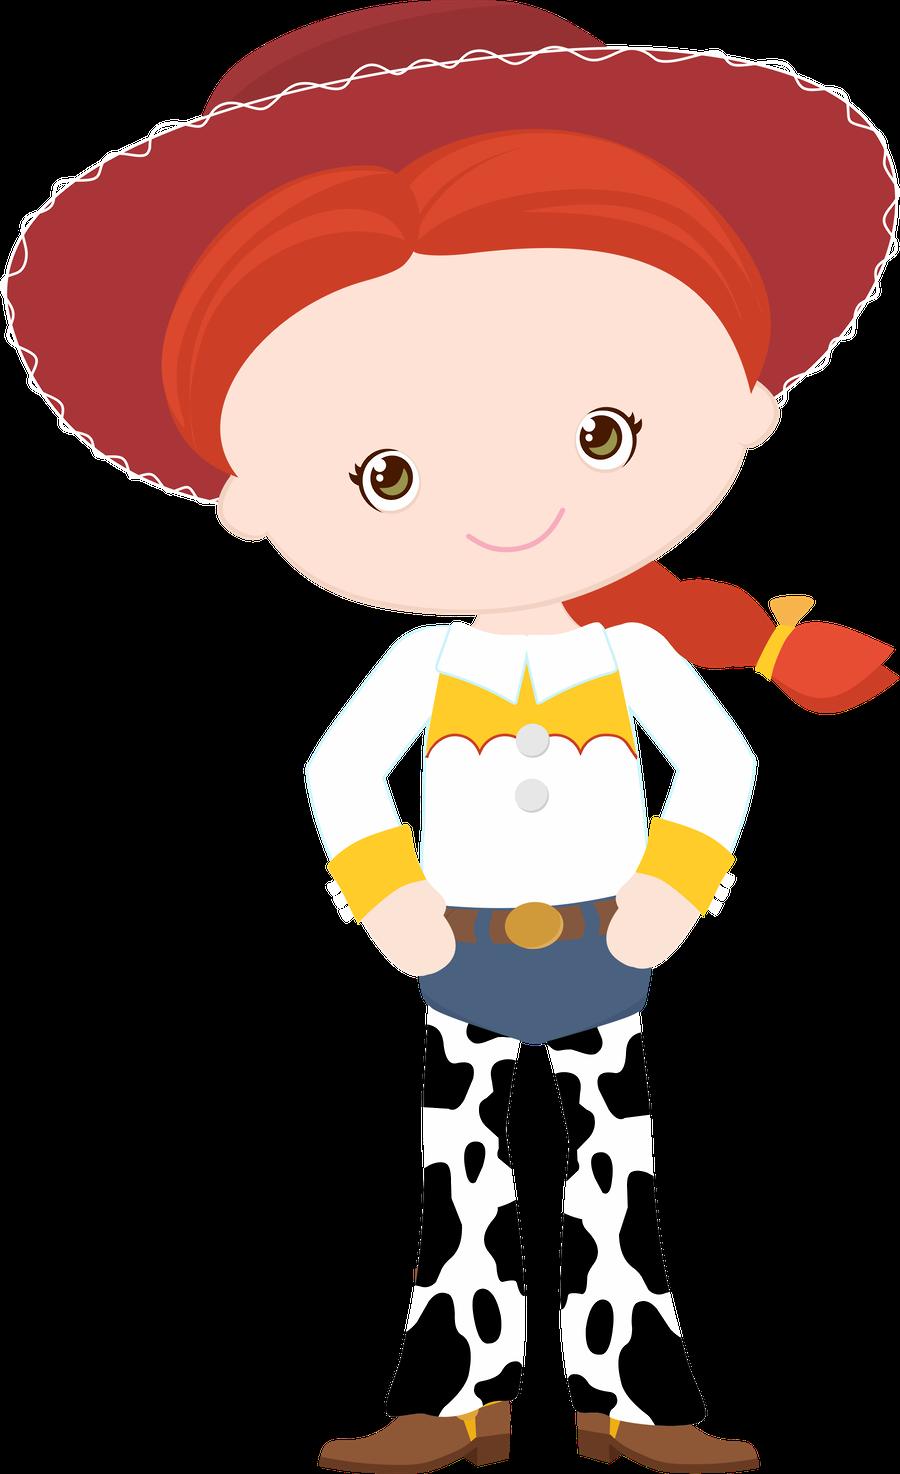 900x1474 Toy Story